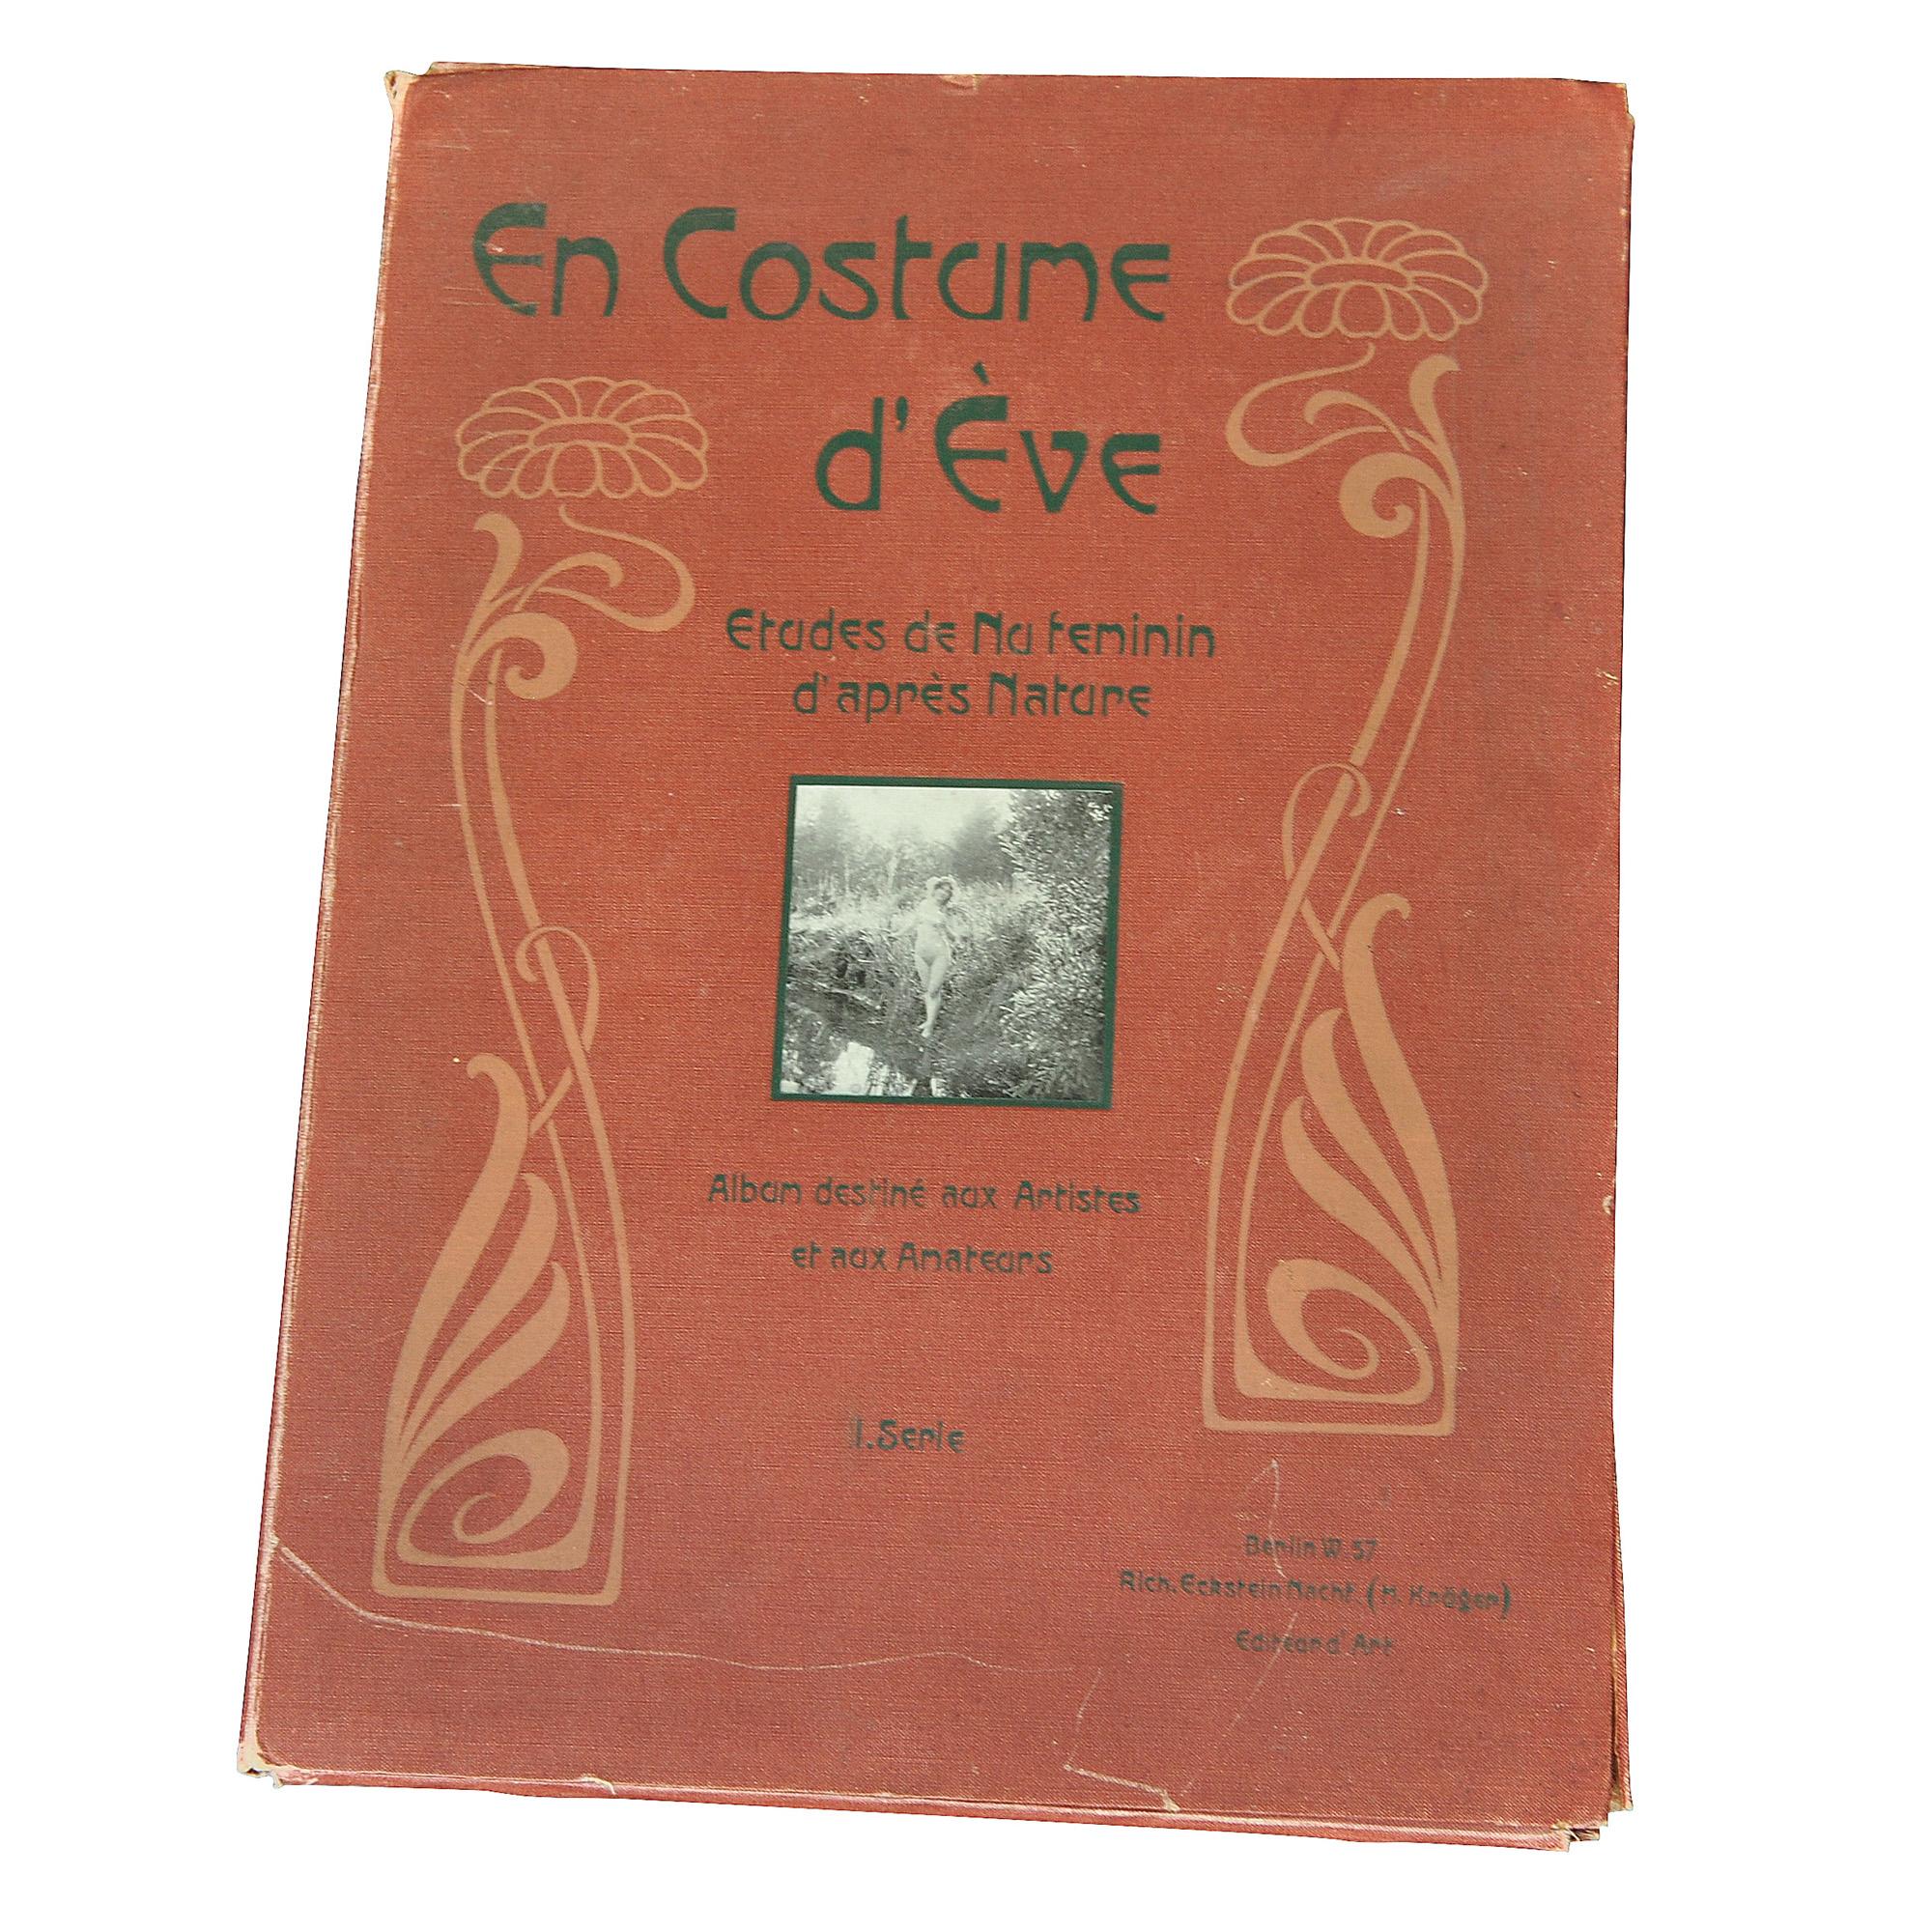 1138-Hummer-Costume-Eve-Akt-1903-1-frei.jpg